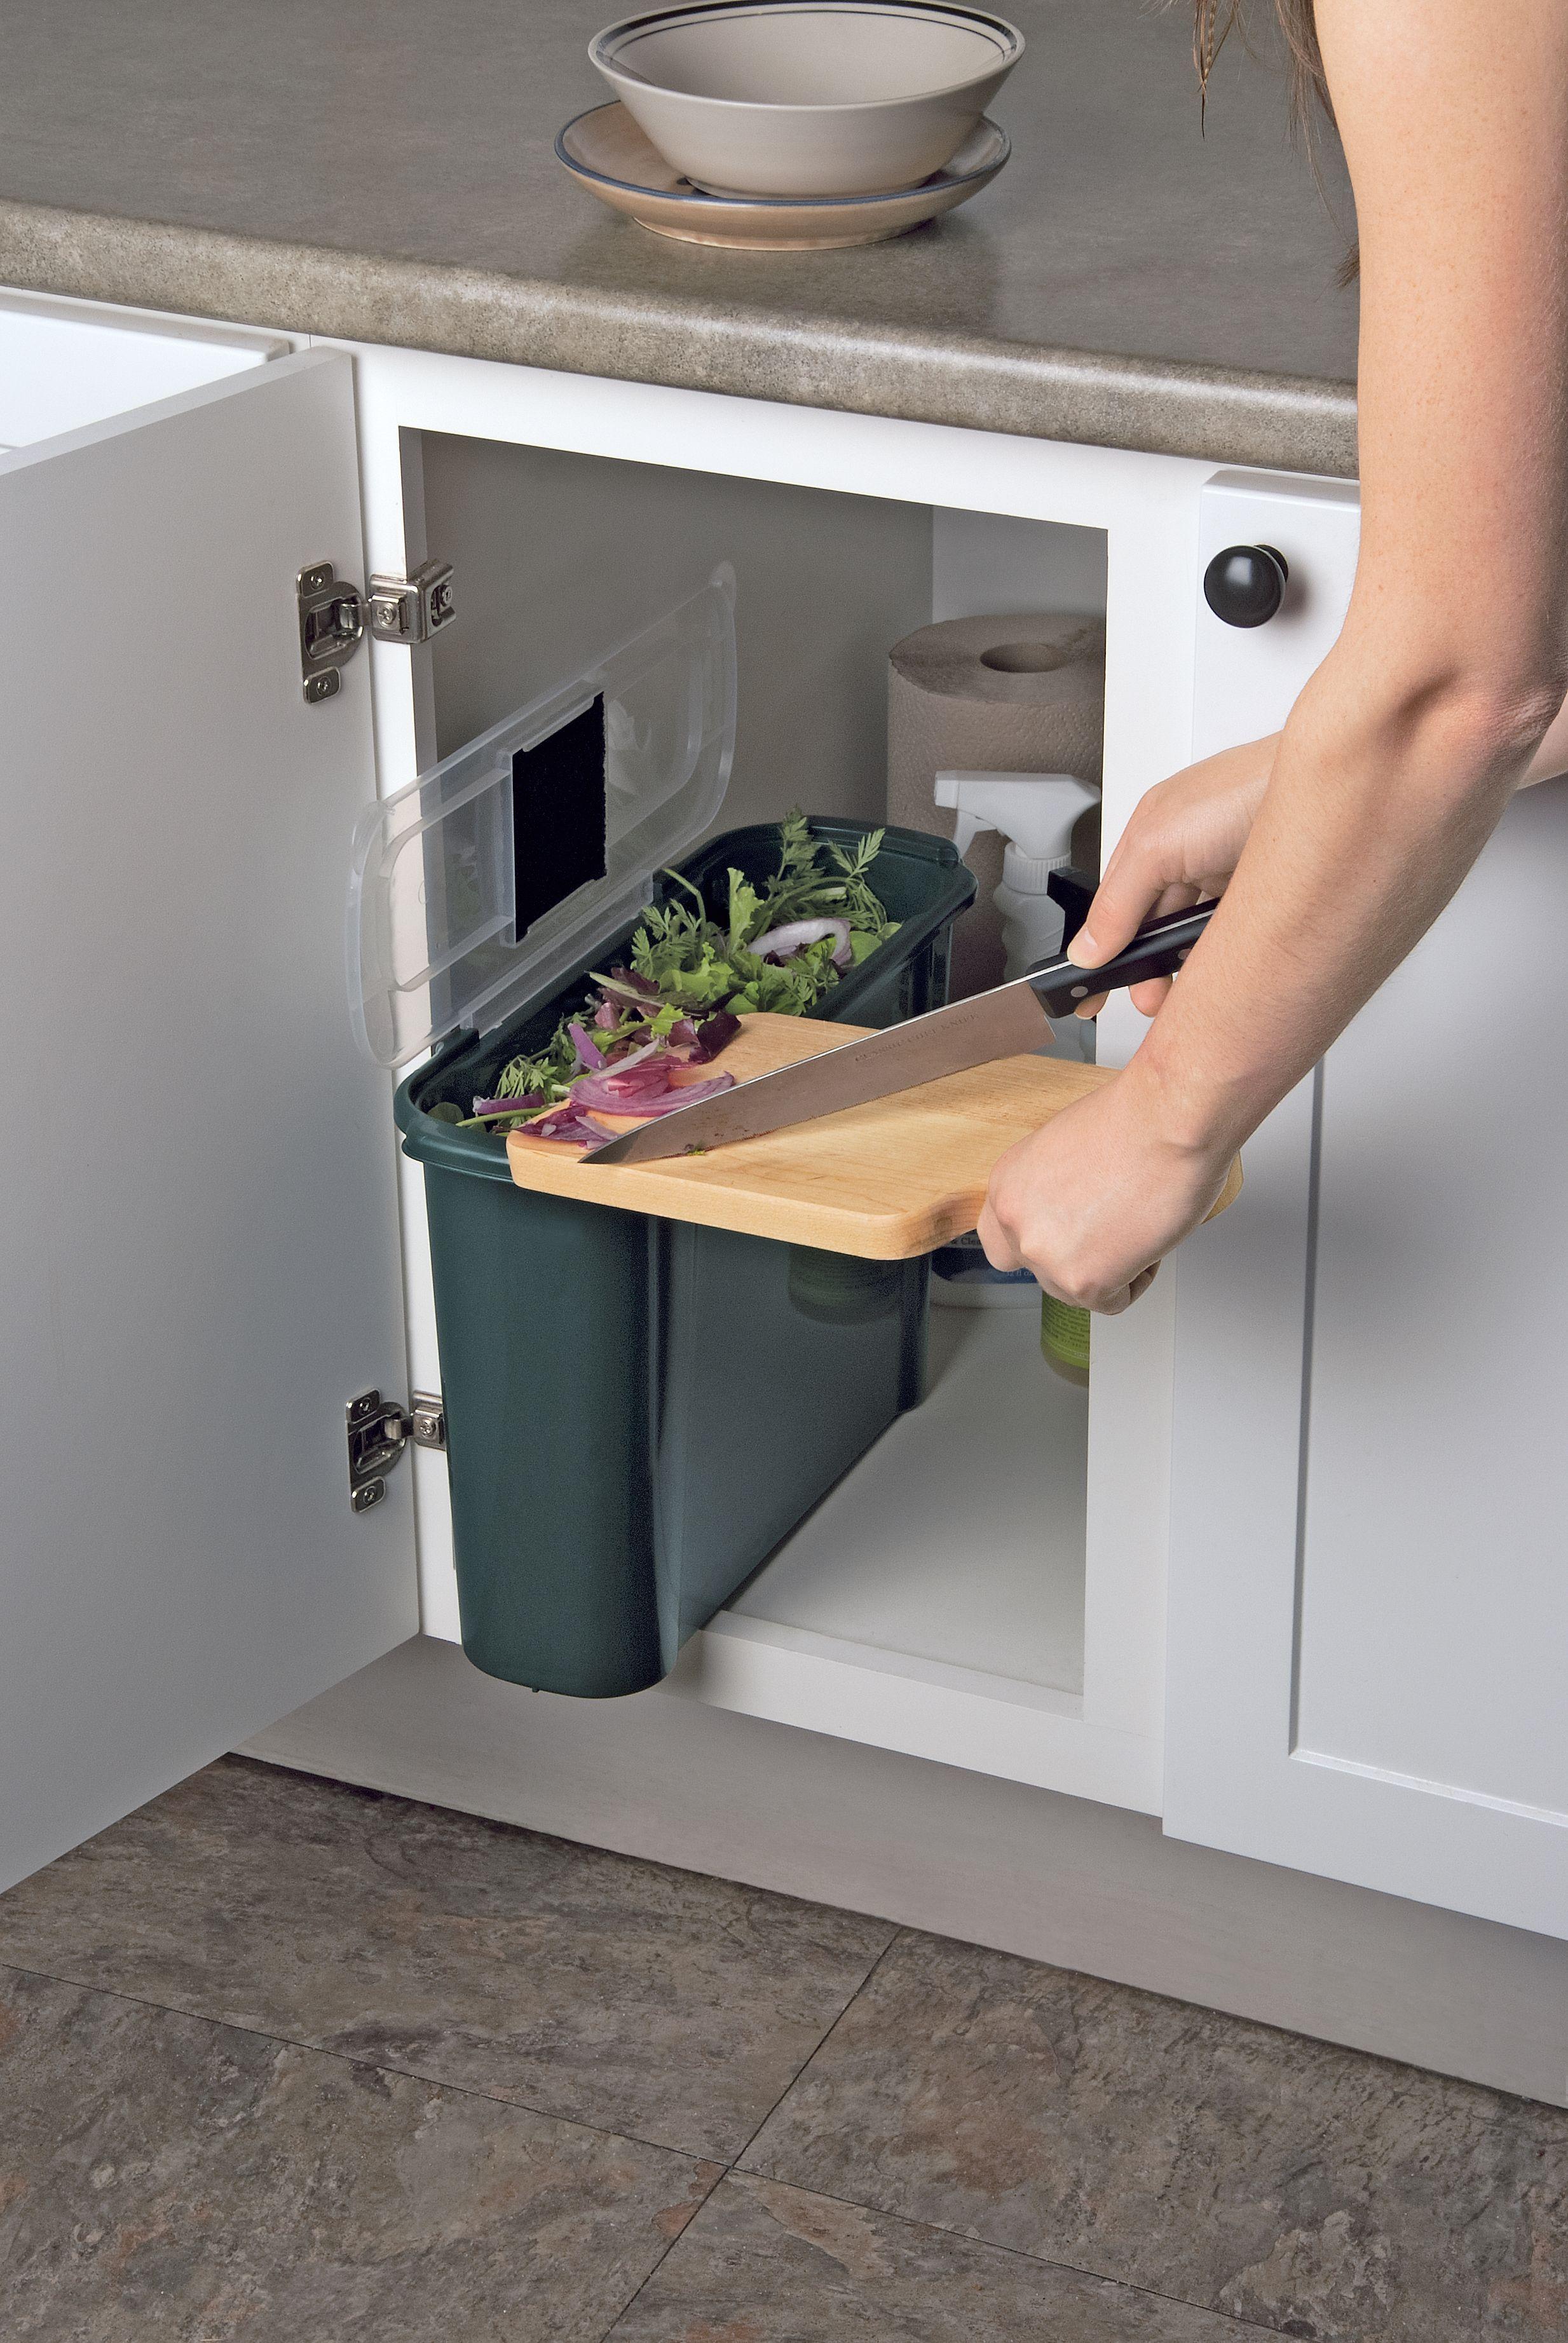 Indoor Composting Bin For Transferring To Outside Bin Slimline